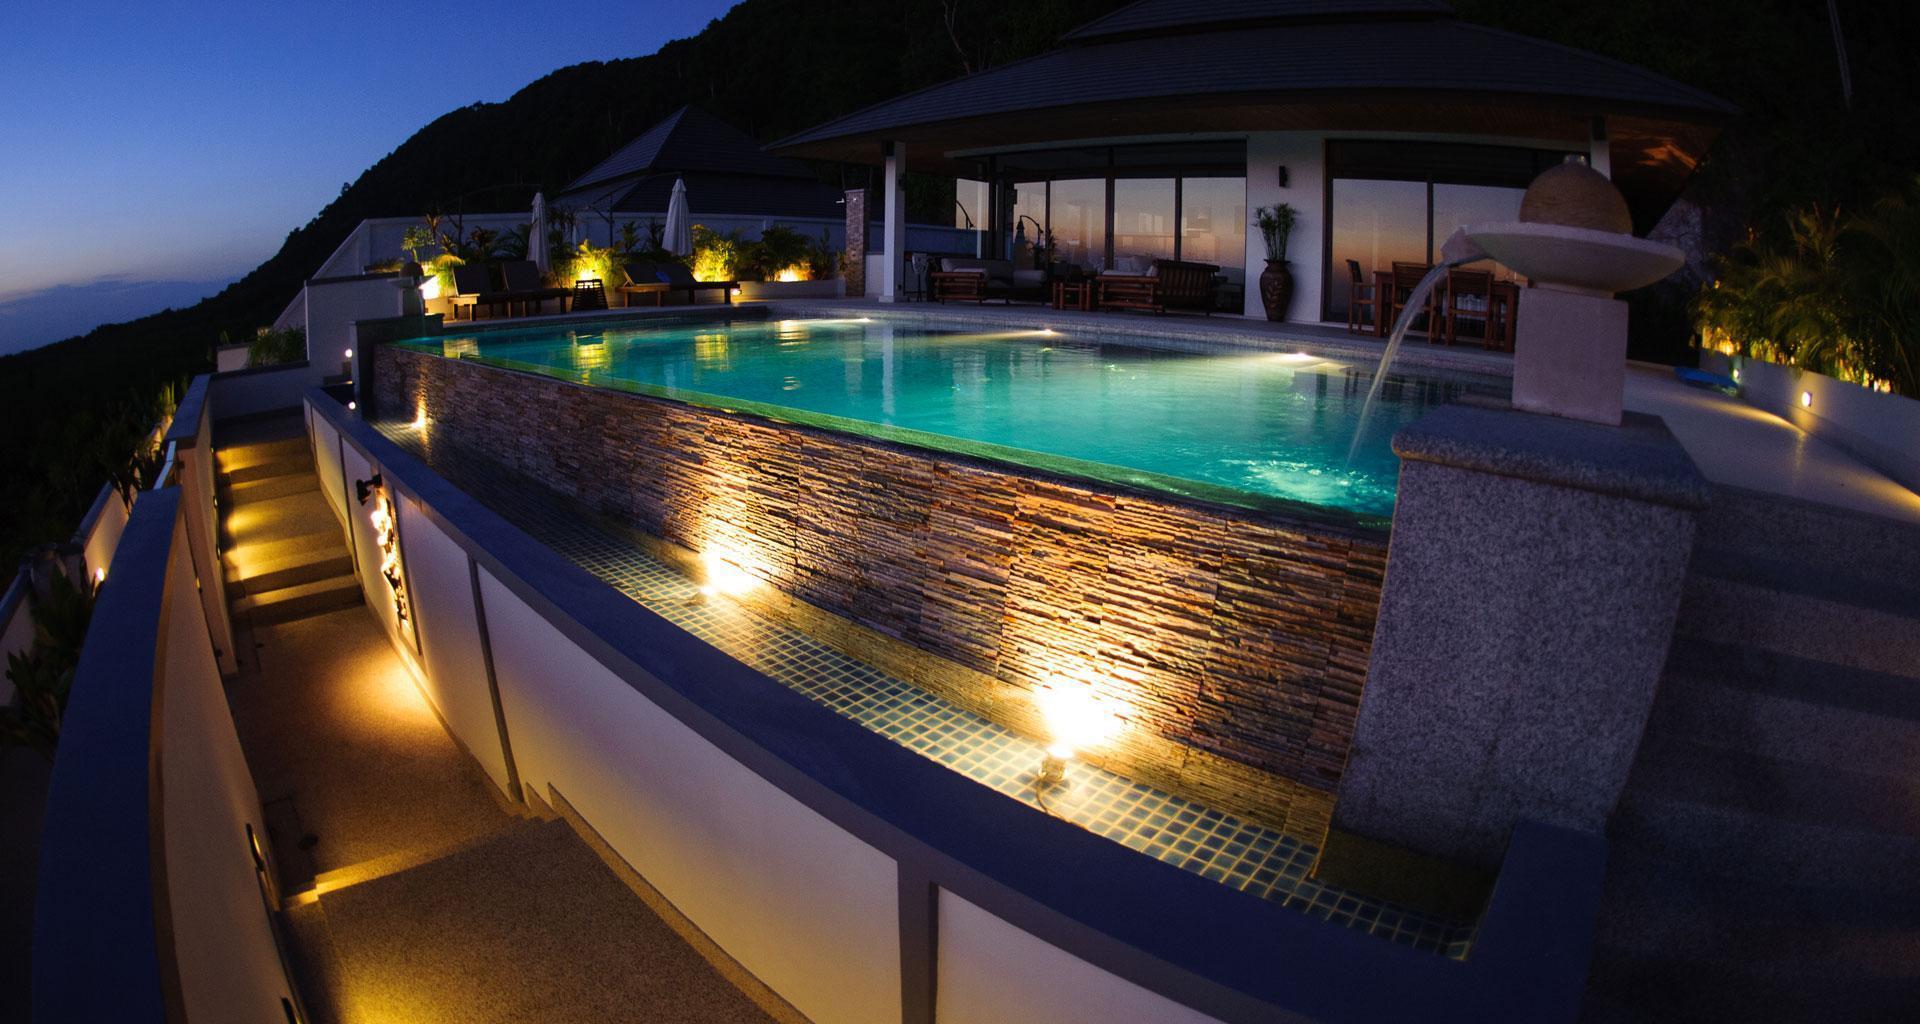 Kulraya Villas - Luxury Serviced Pool Villas (A) วิลลา 2 ห้องนอน 2 ห้องน้ำส่วนตัว ขนาด 400 ตร.ม. – หาดพระแอะ